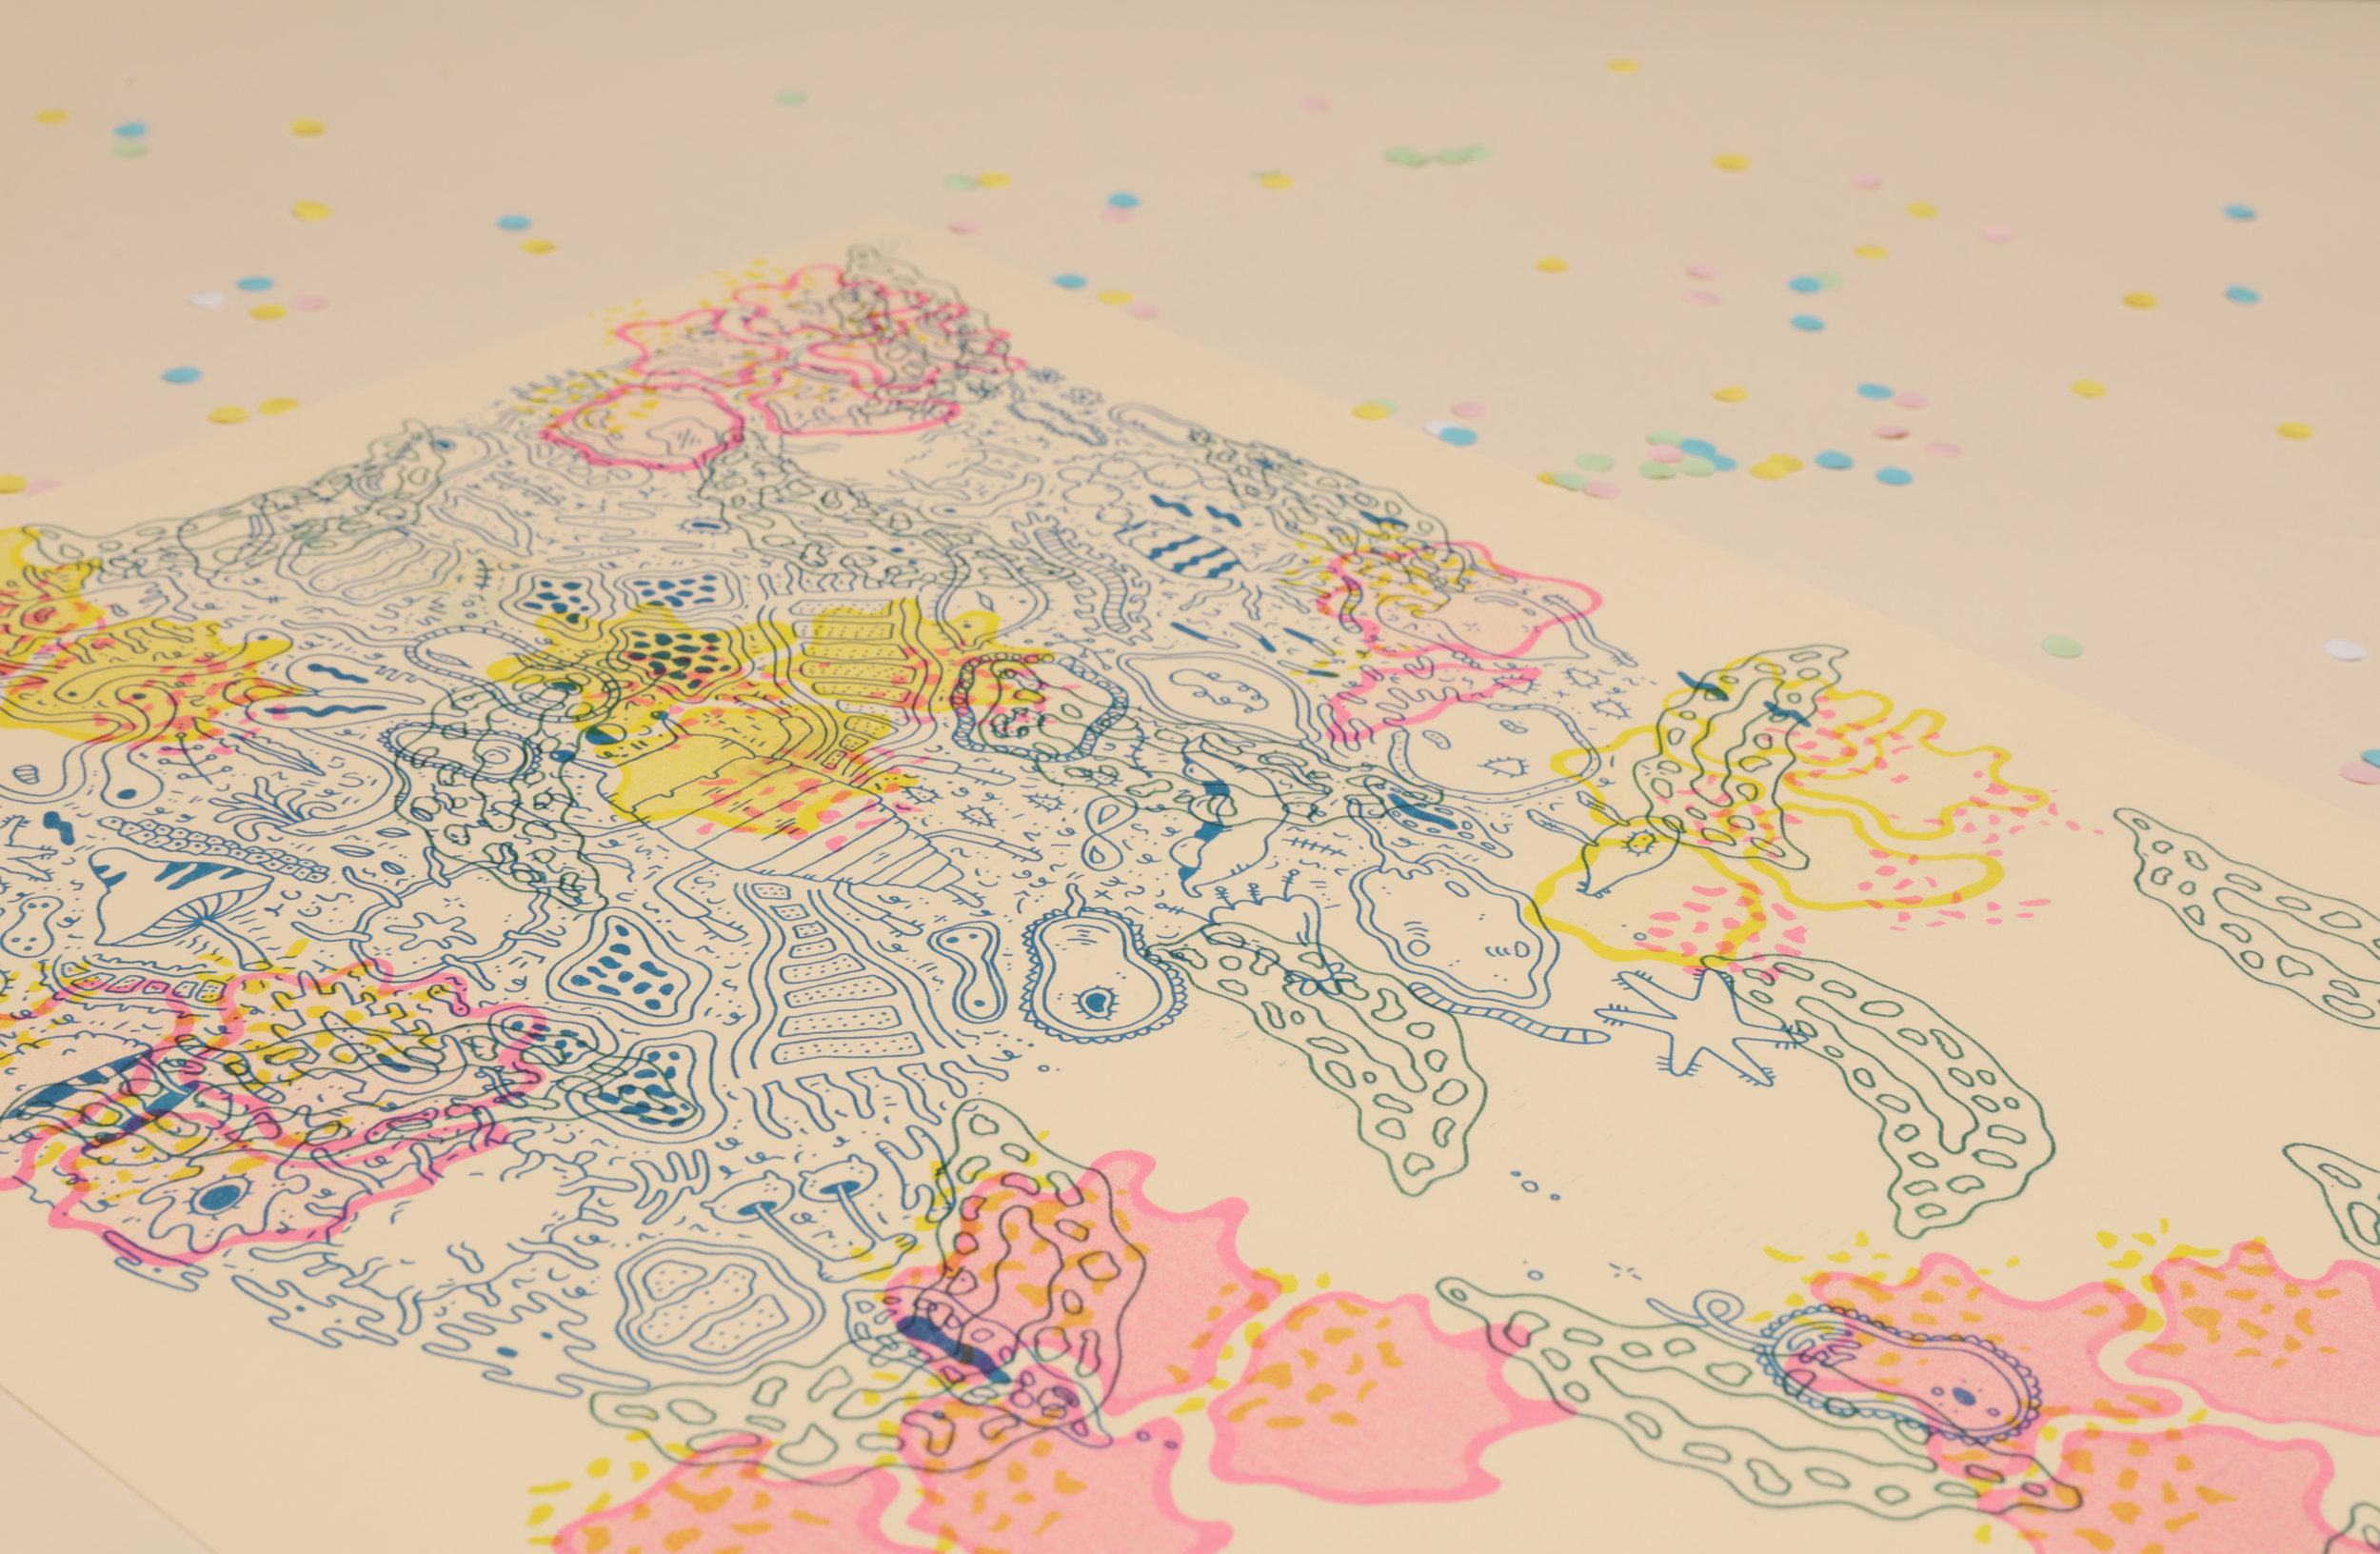 Above: Chippy's 'Micromash Risograph print'